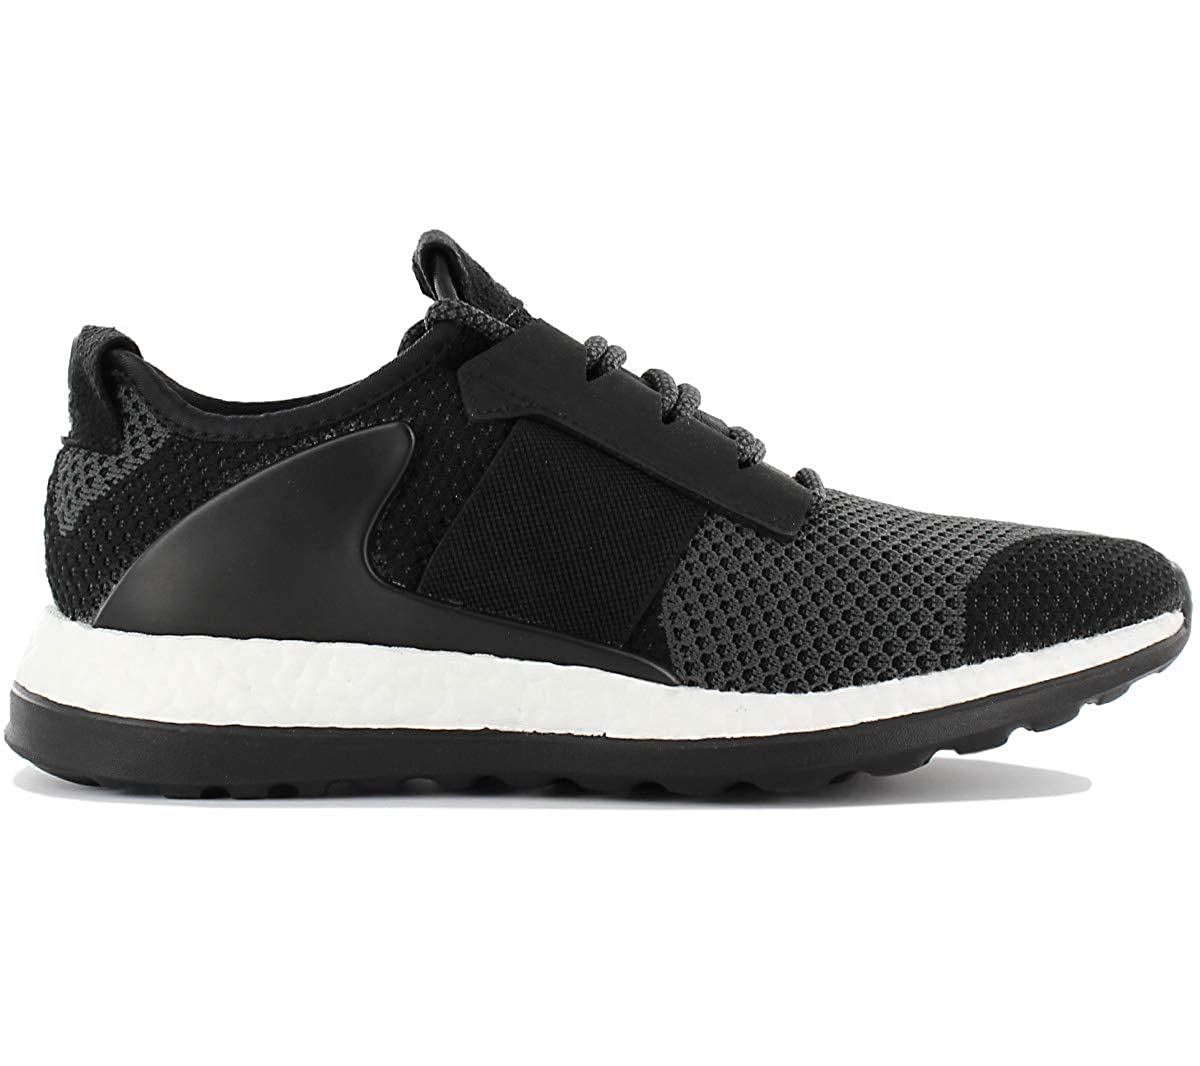 Adidas Performance Herren Day One One One Pure Boost ZG Turnschuhe Schuhe -Schwarz 6df546